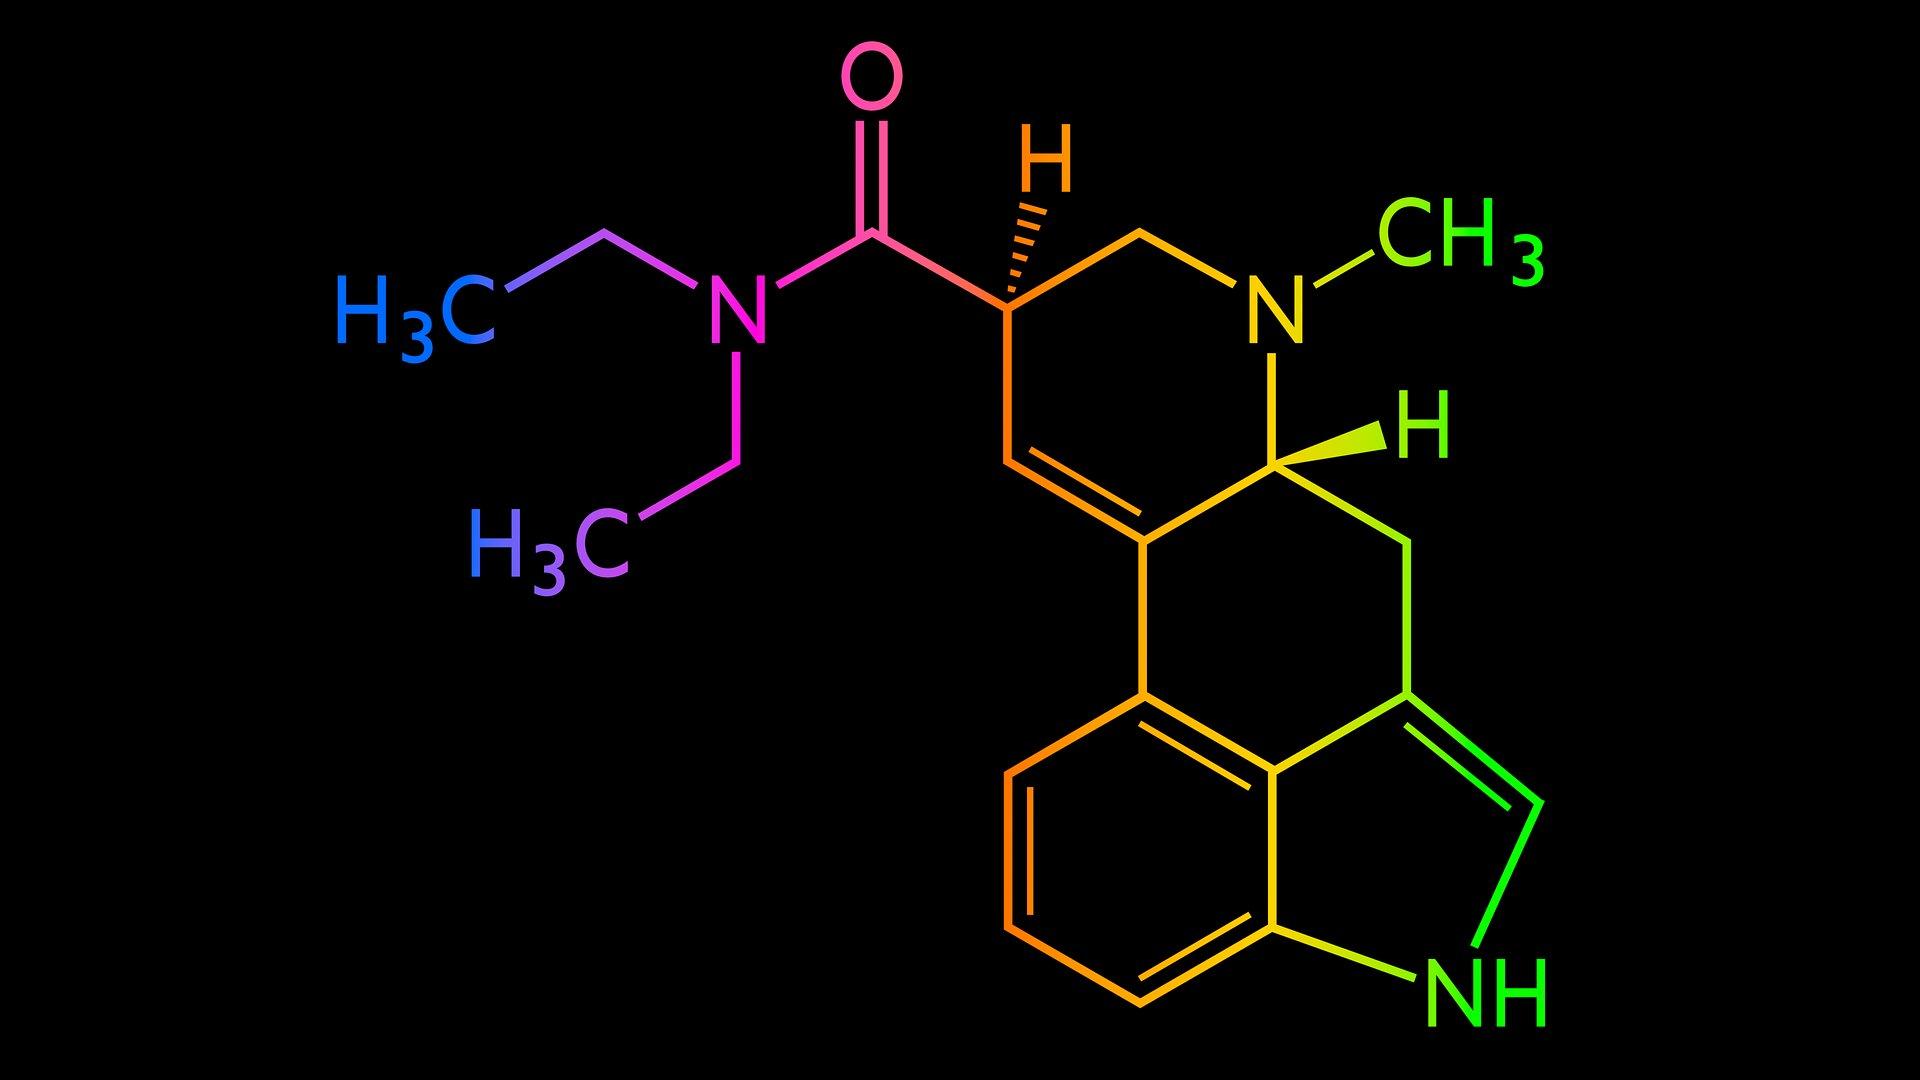 https://psilocybinetherapienederland.nl/wp-content/uploads/2019/10/LSD-molecuul.jpg